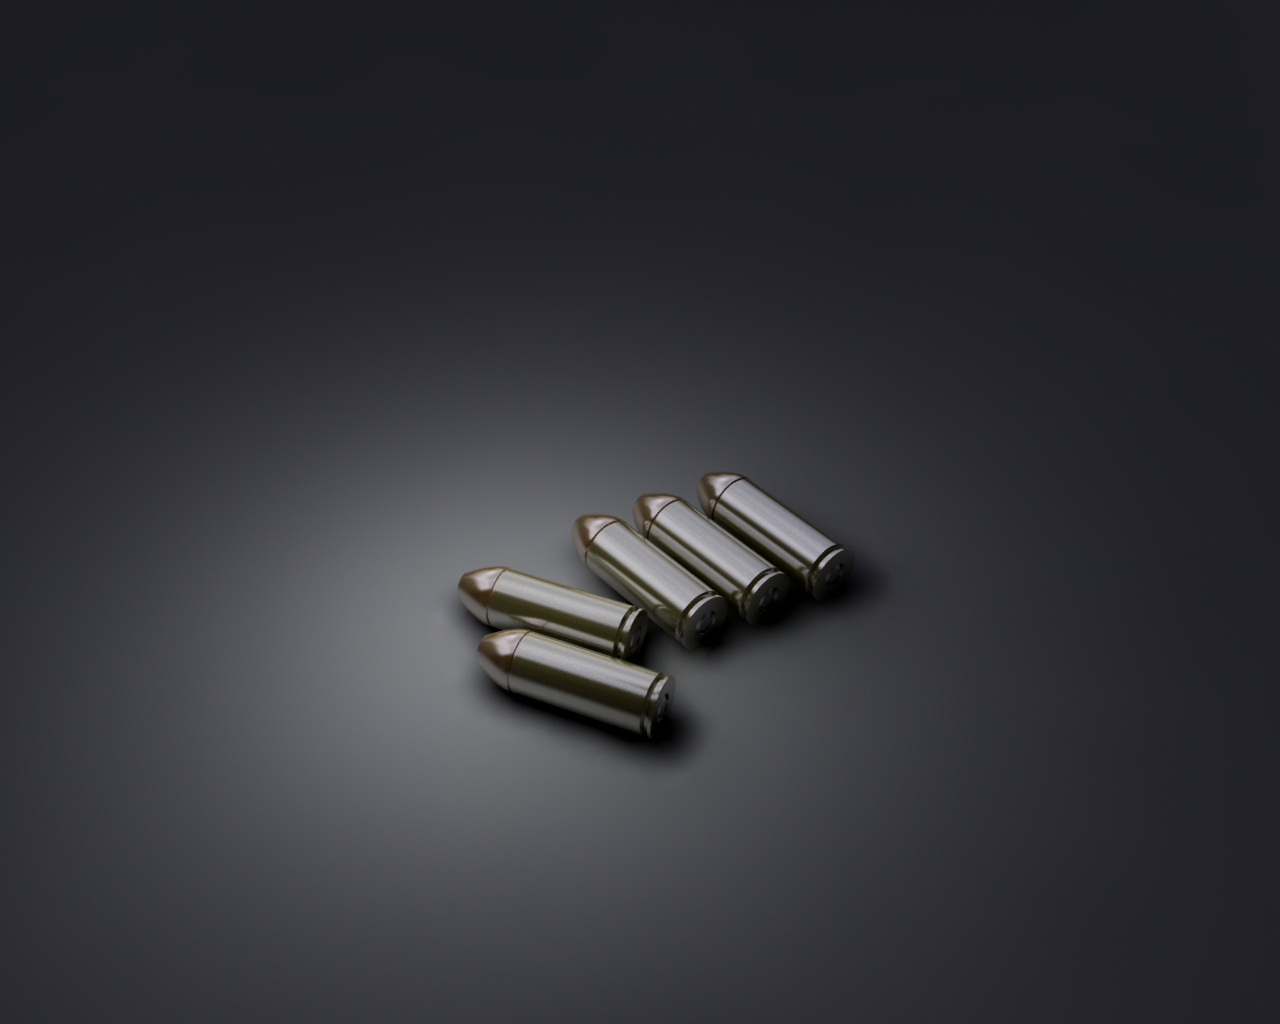 http://4.bp.blogspot.com/-VjP-RtXJgto/TccNqkKks7I/AAAAAAAABPs/bOjcYei3bO0/s1600/bullet_10.png